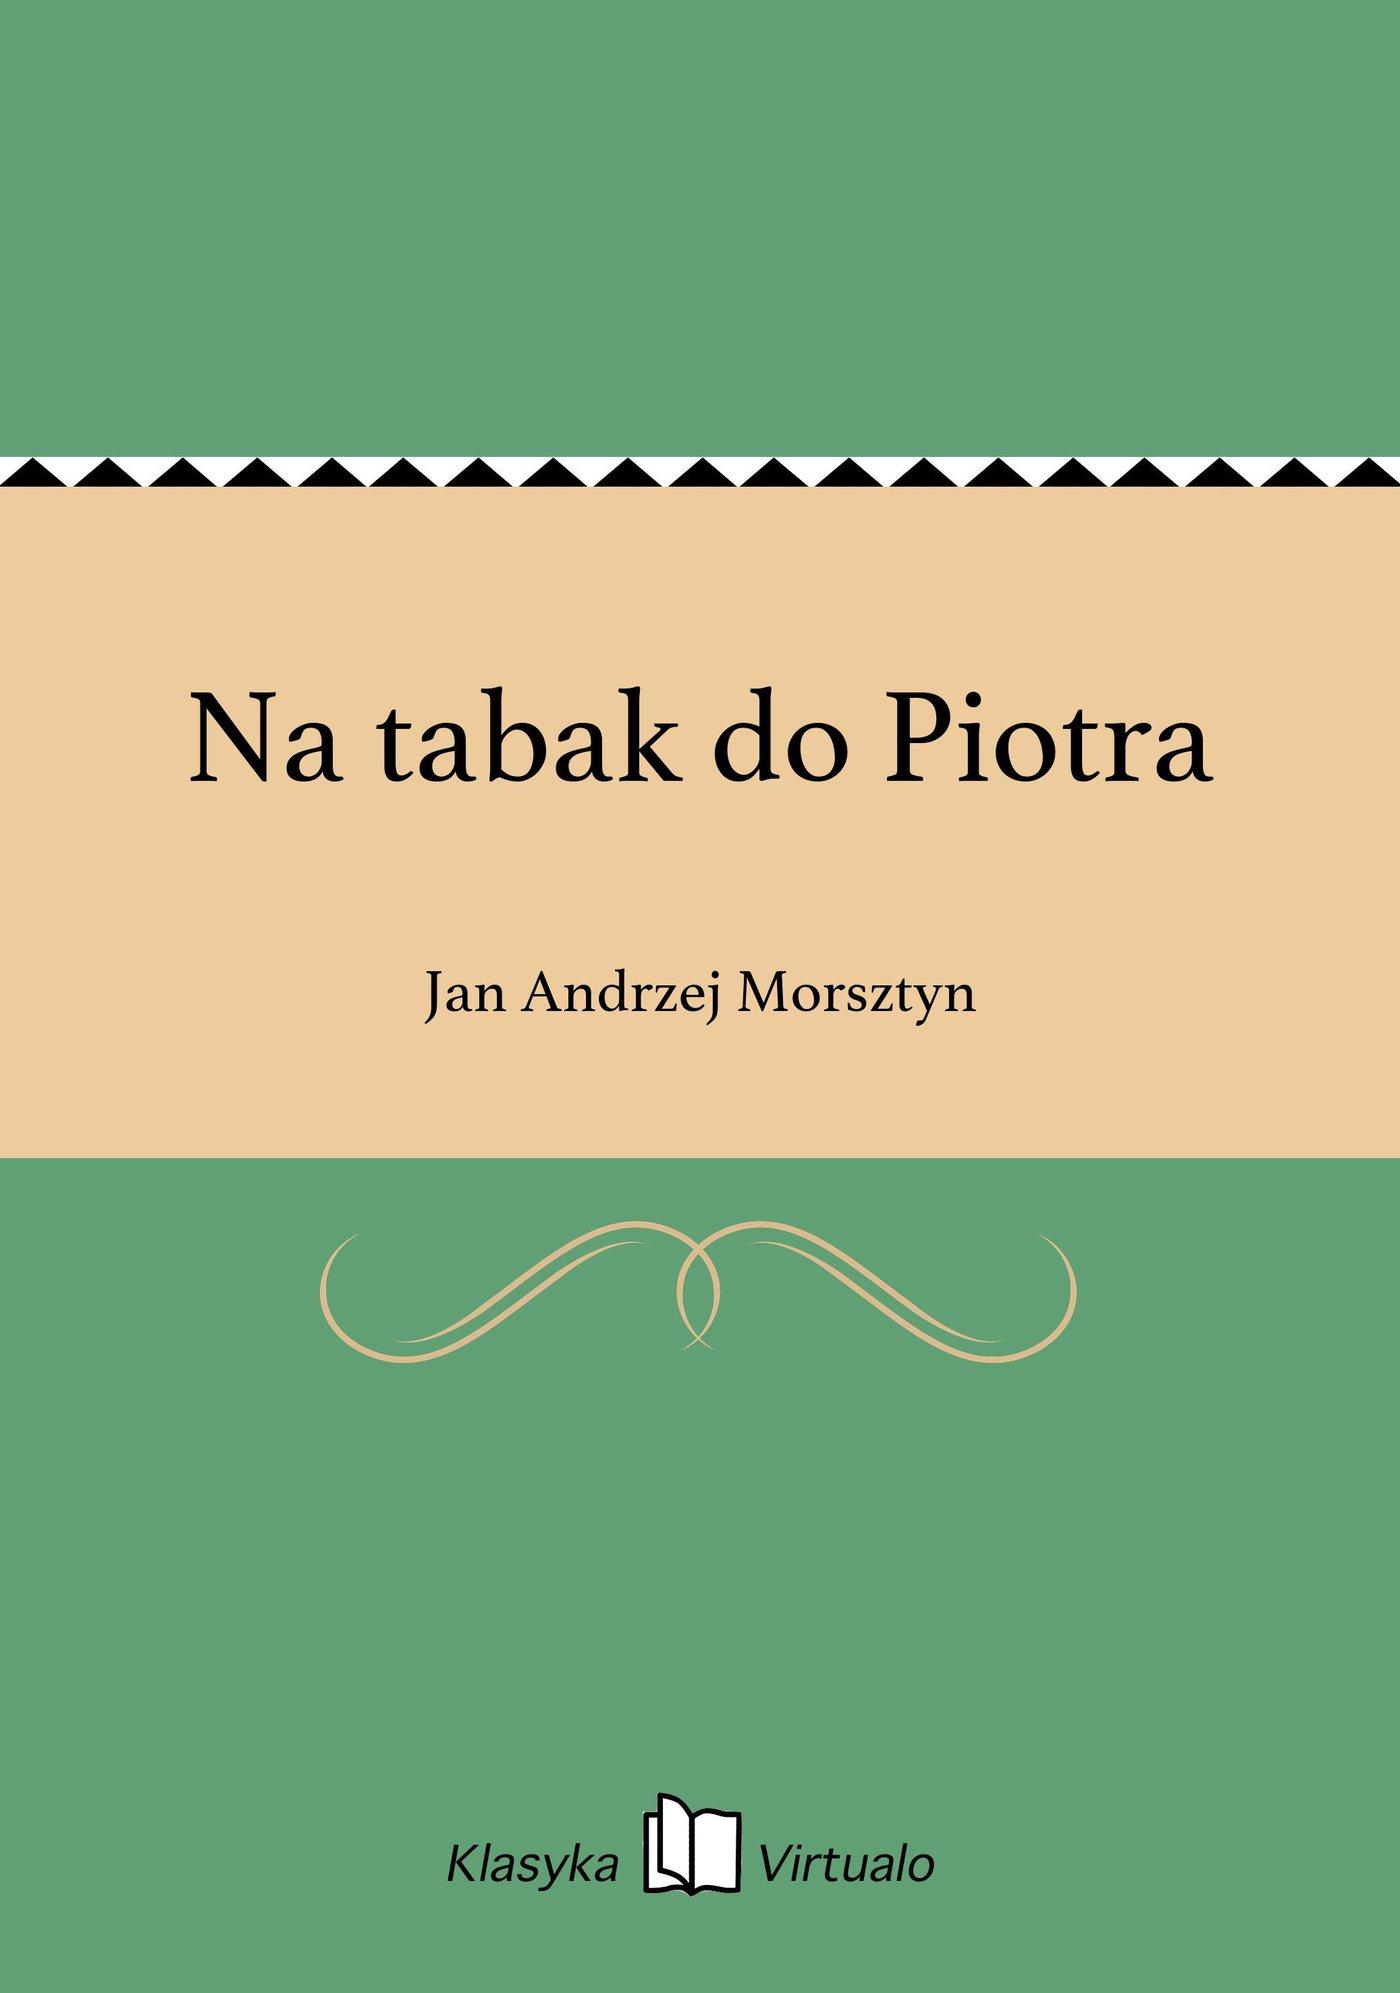 Na tabak do Piotra - Ebook (Książka na Kindle) do pobrania w formacie MOBI